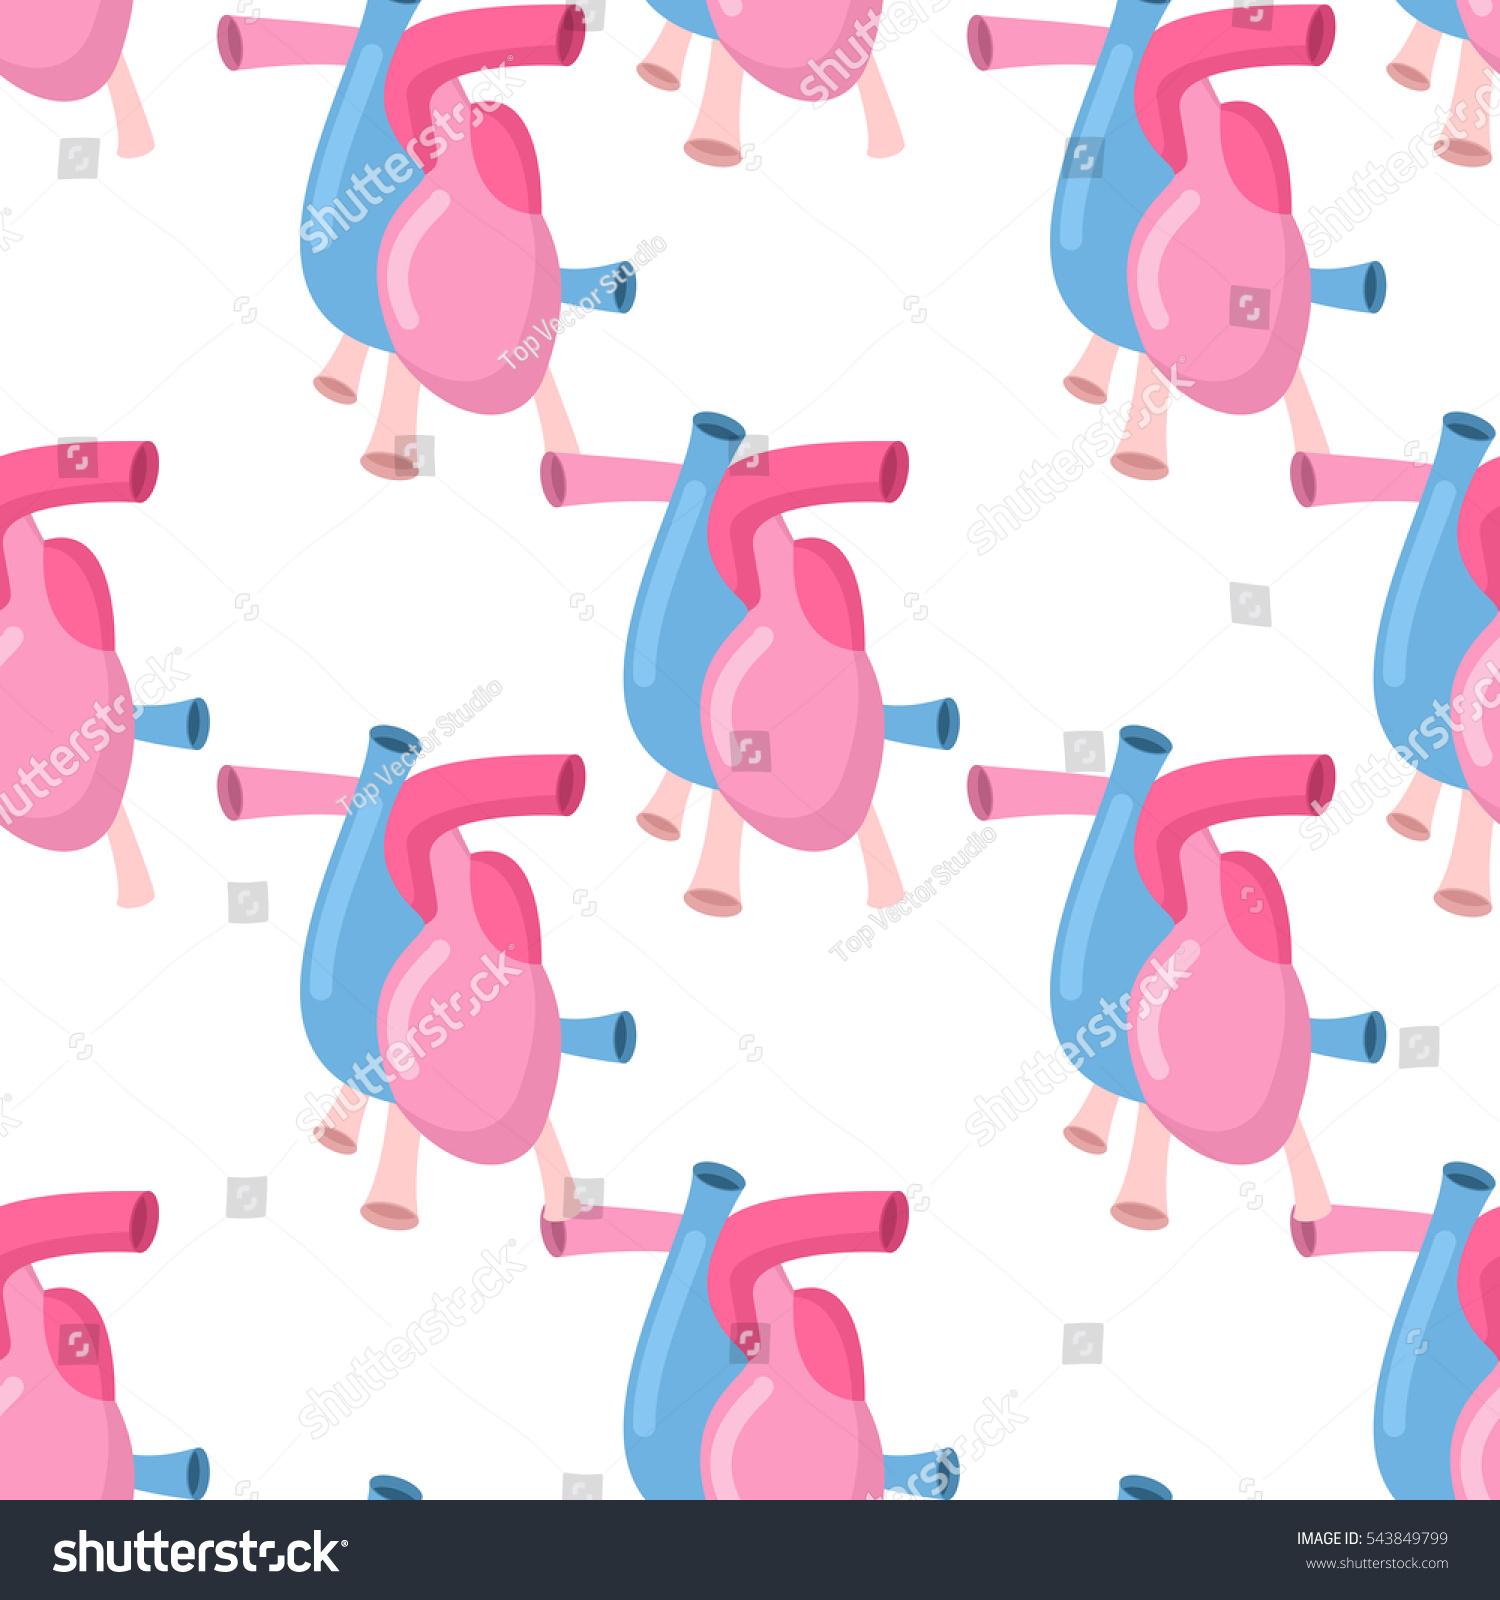 Heart Anatomy Body Seamless Pattern Atrial Stock Vector 543849799 ...